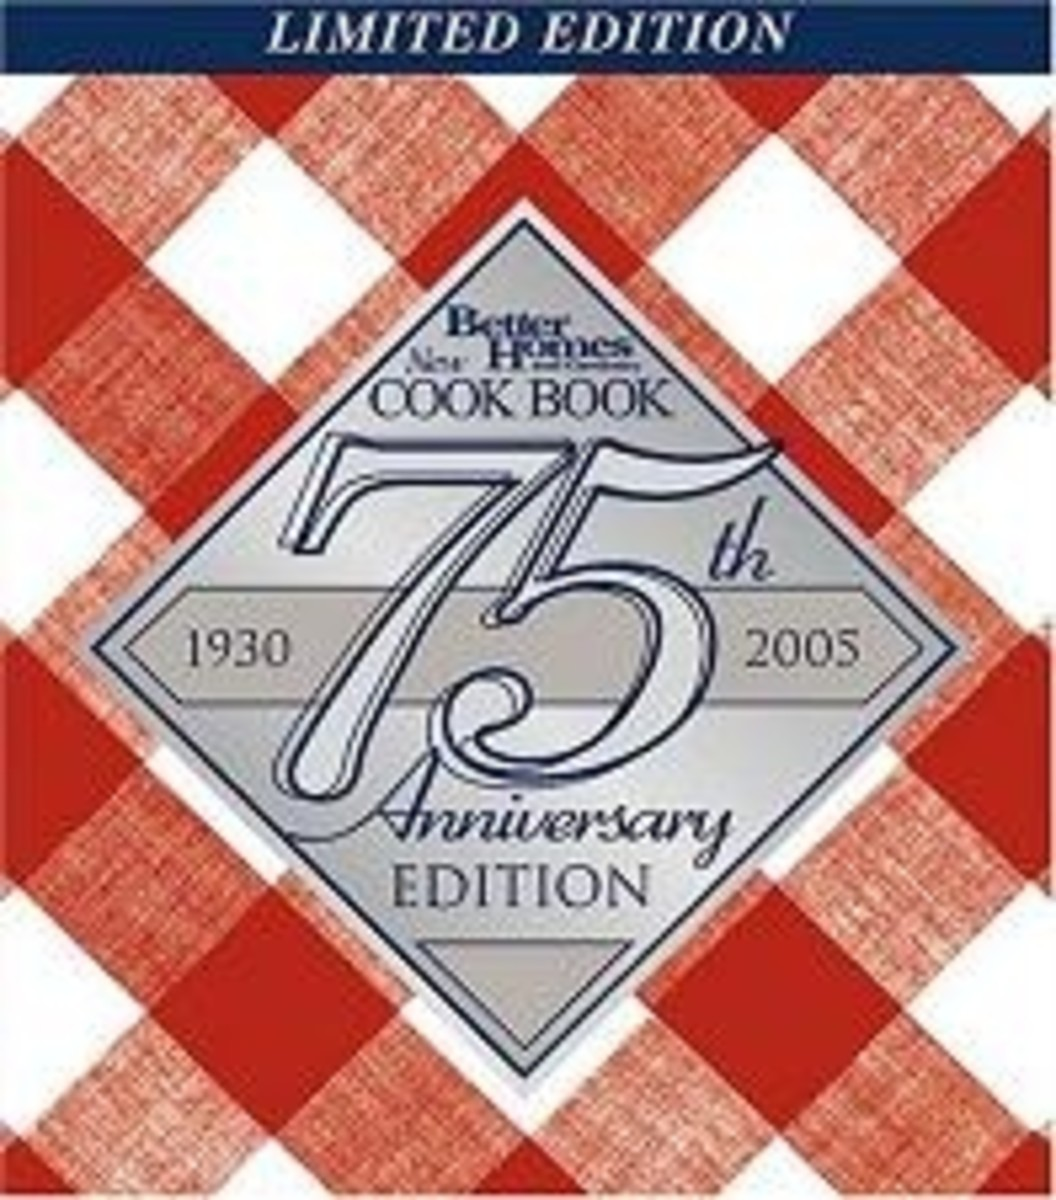 75th Anniversary Edition 2005